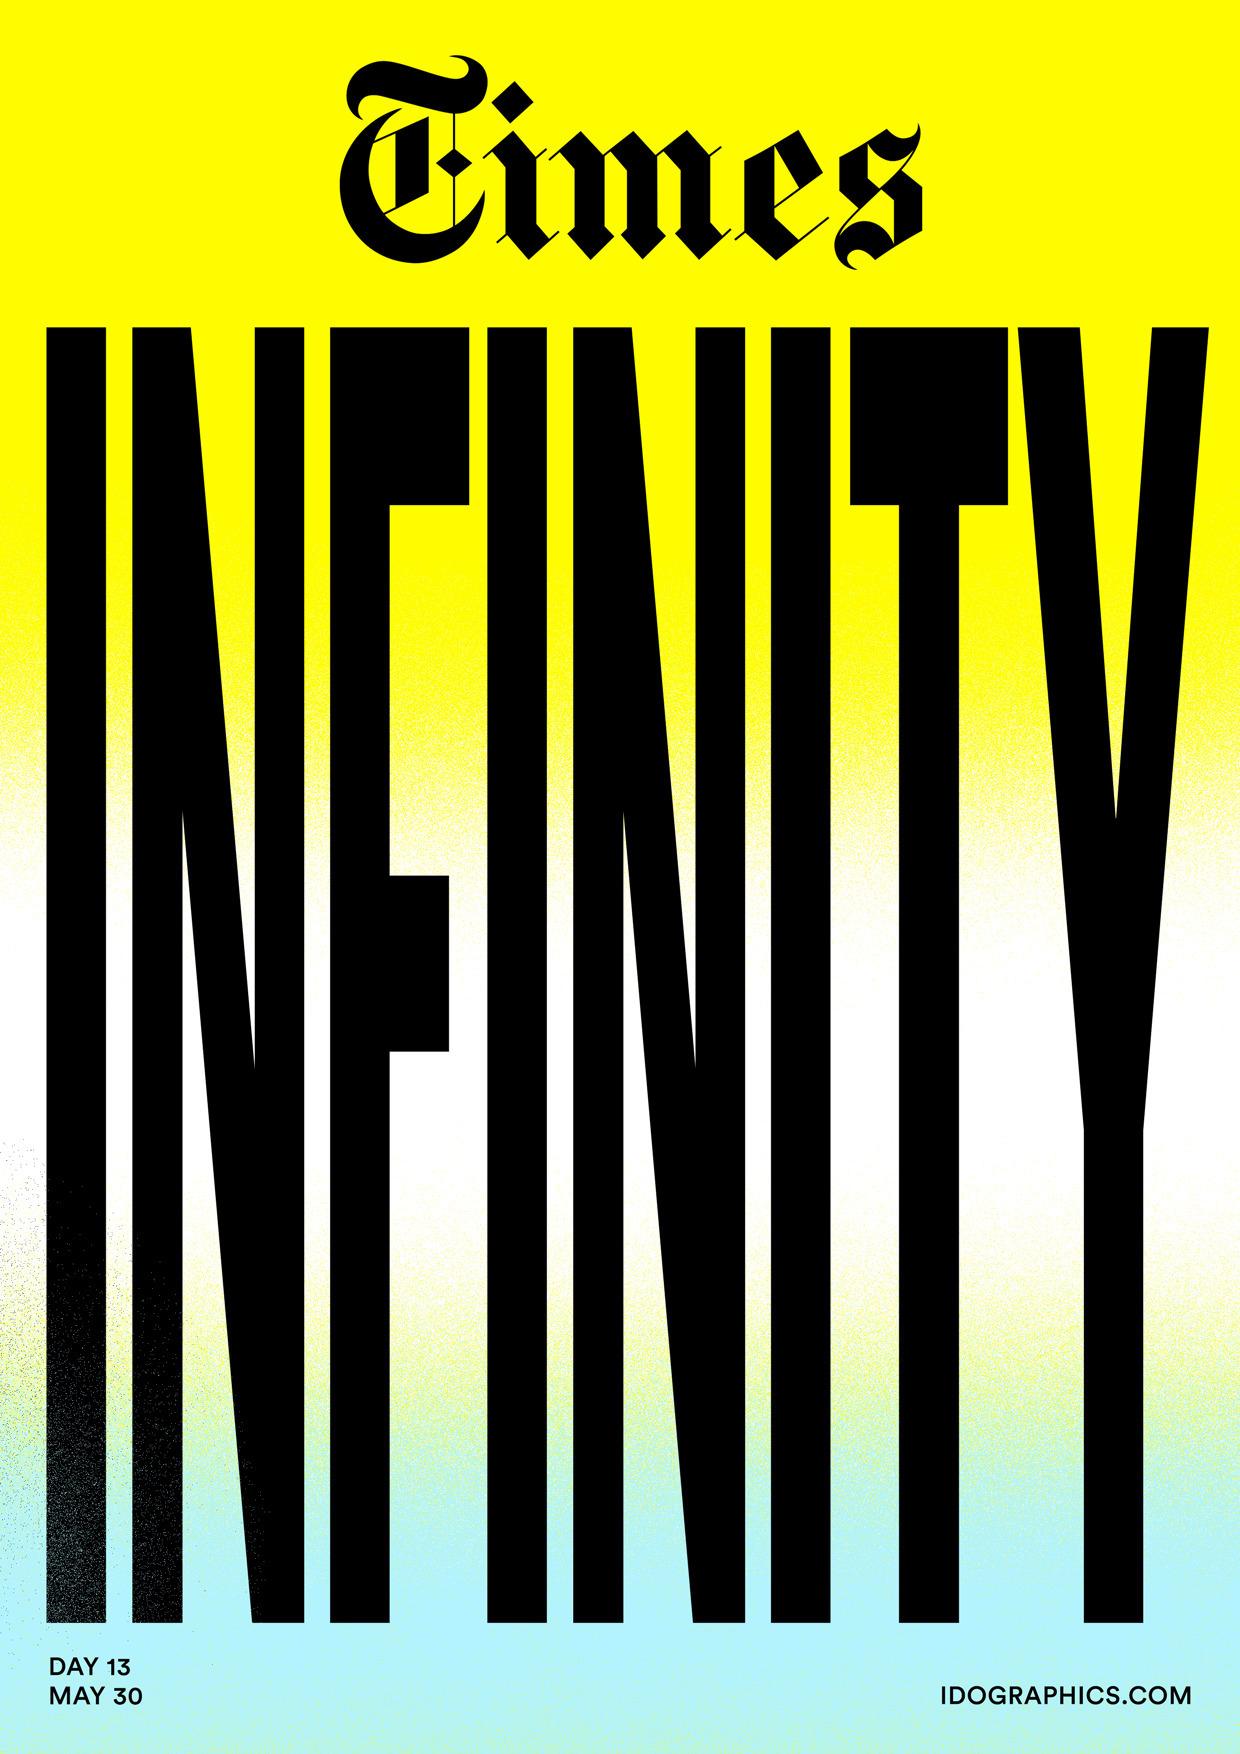 TIMES INFINITY - design, typography - idographics   ello